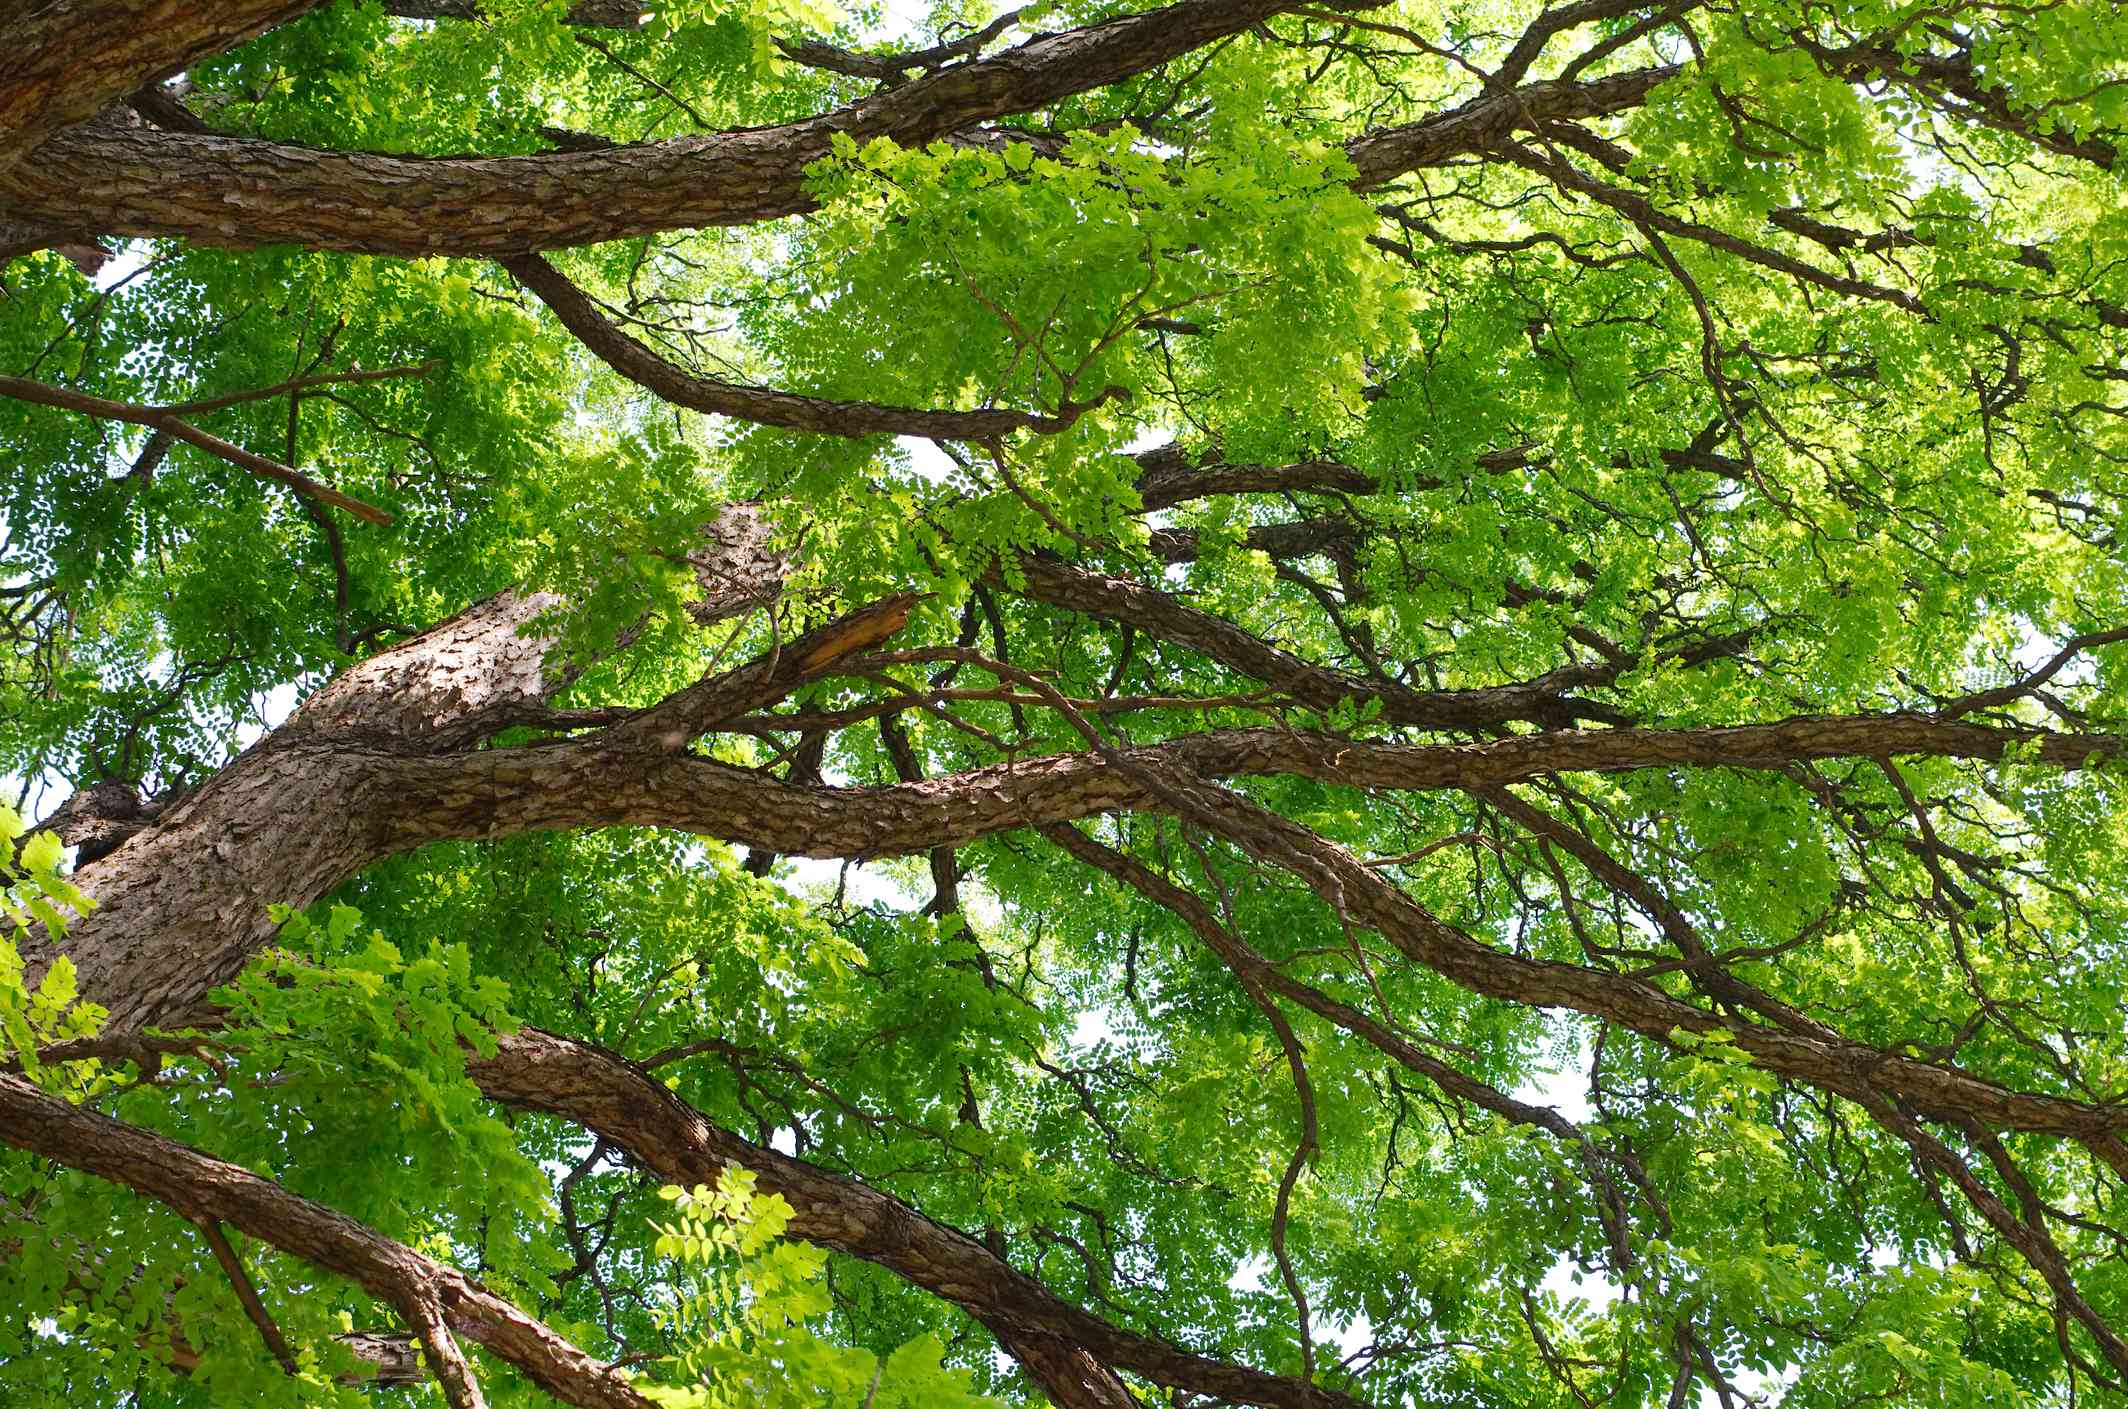 Kentucky Coffeetree Canopy